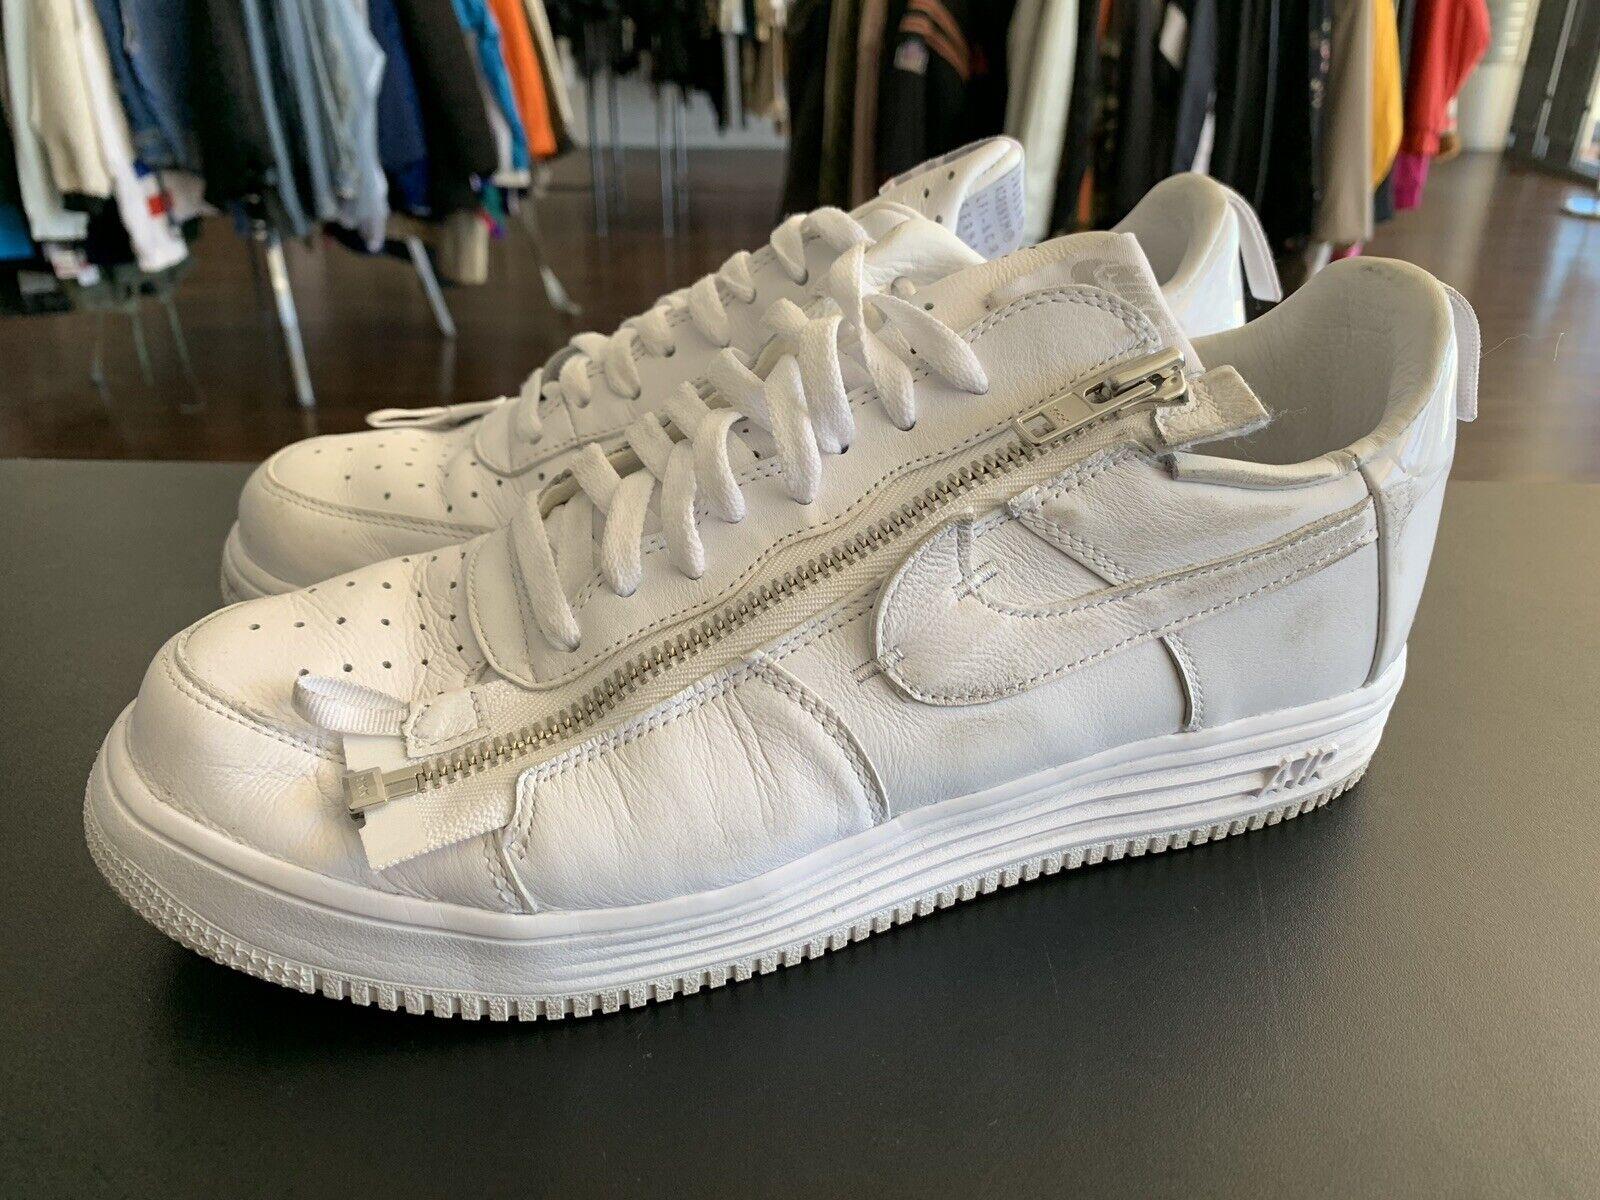 Nike Lunar Force 1 X Acronym '17 Size 11 White AJ6247-100